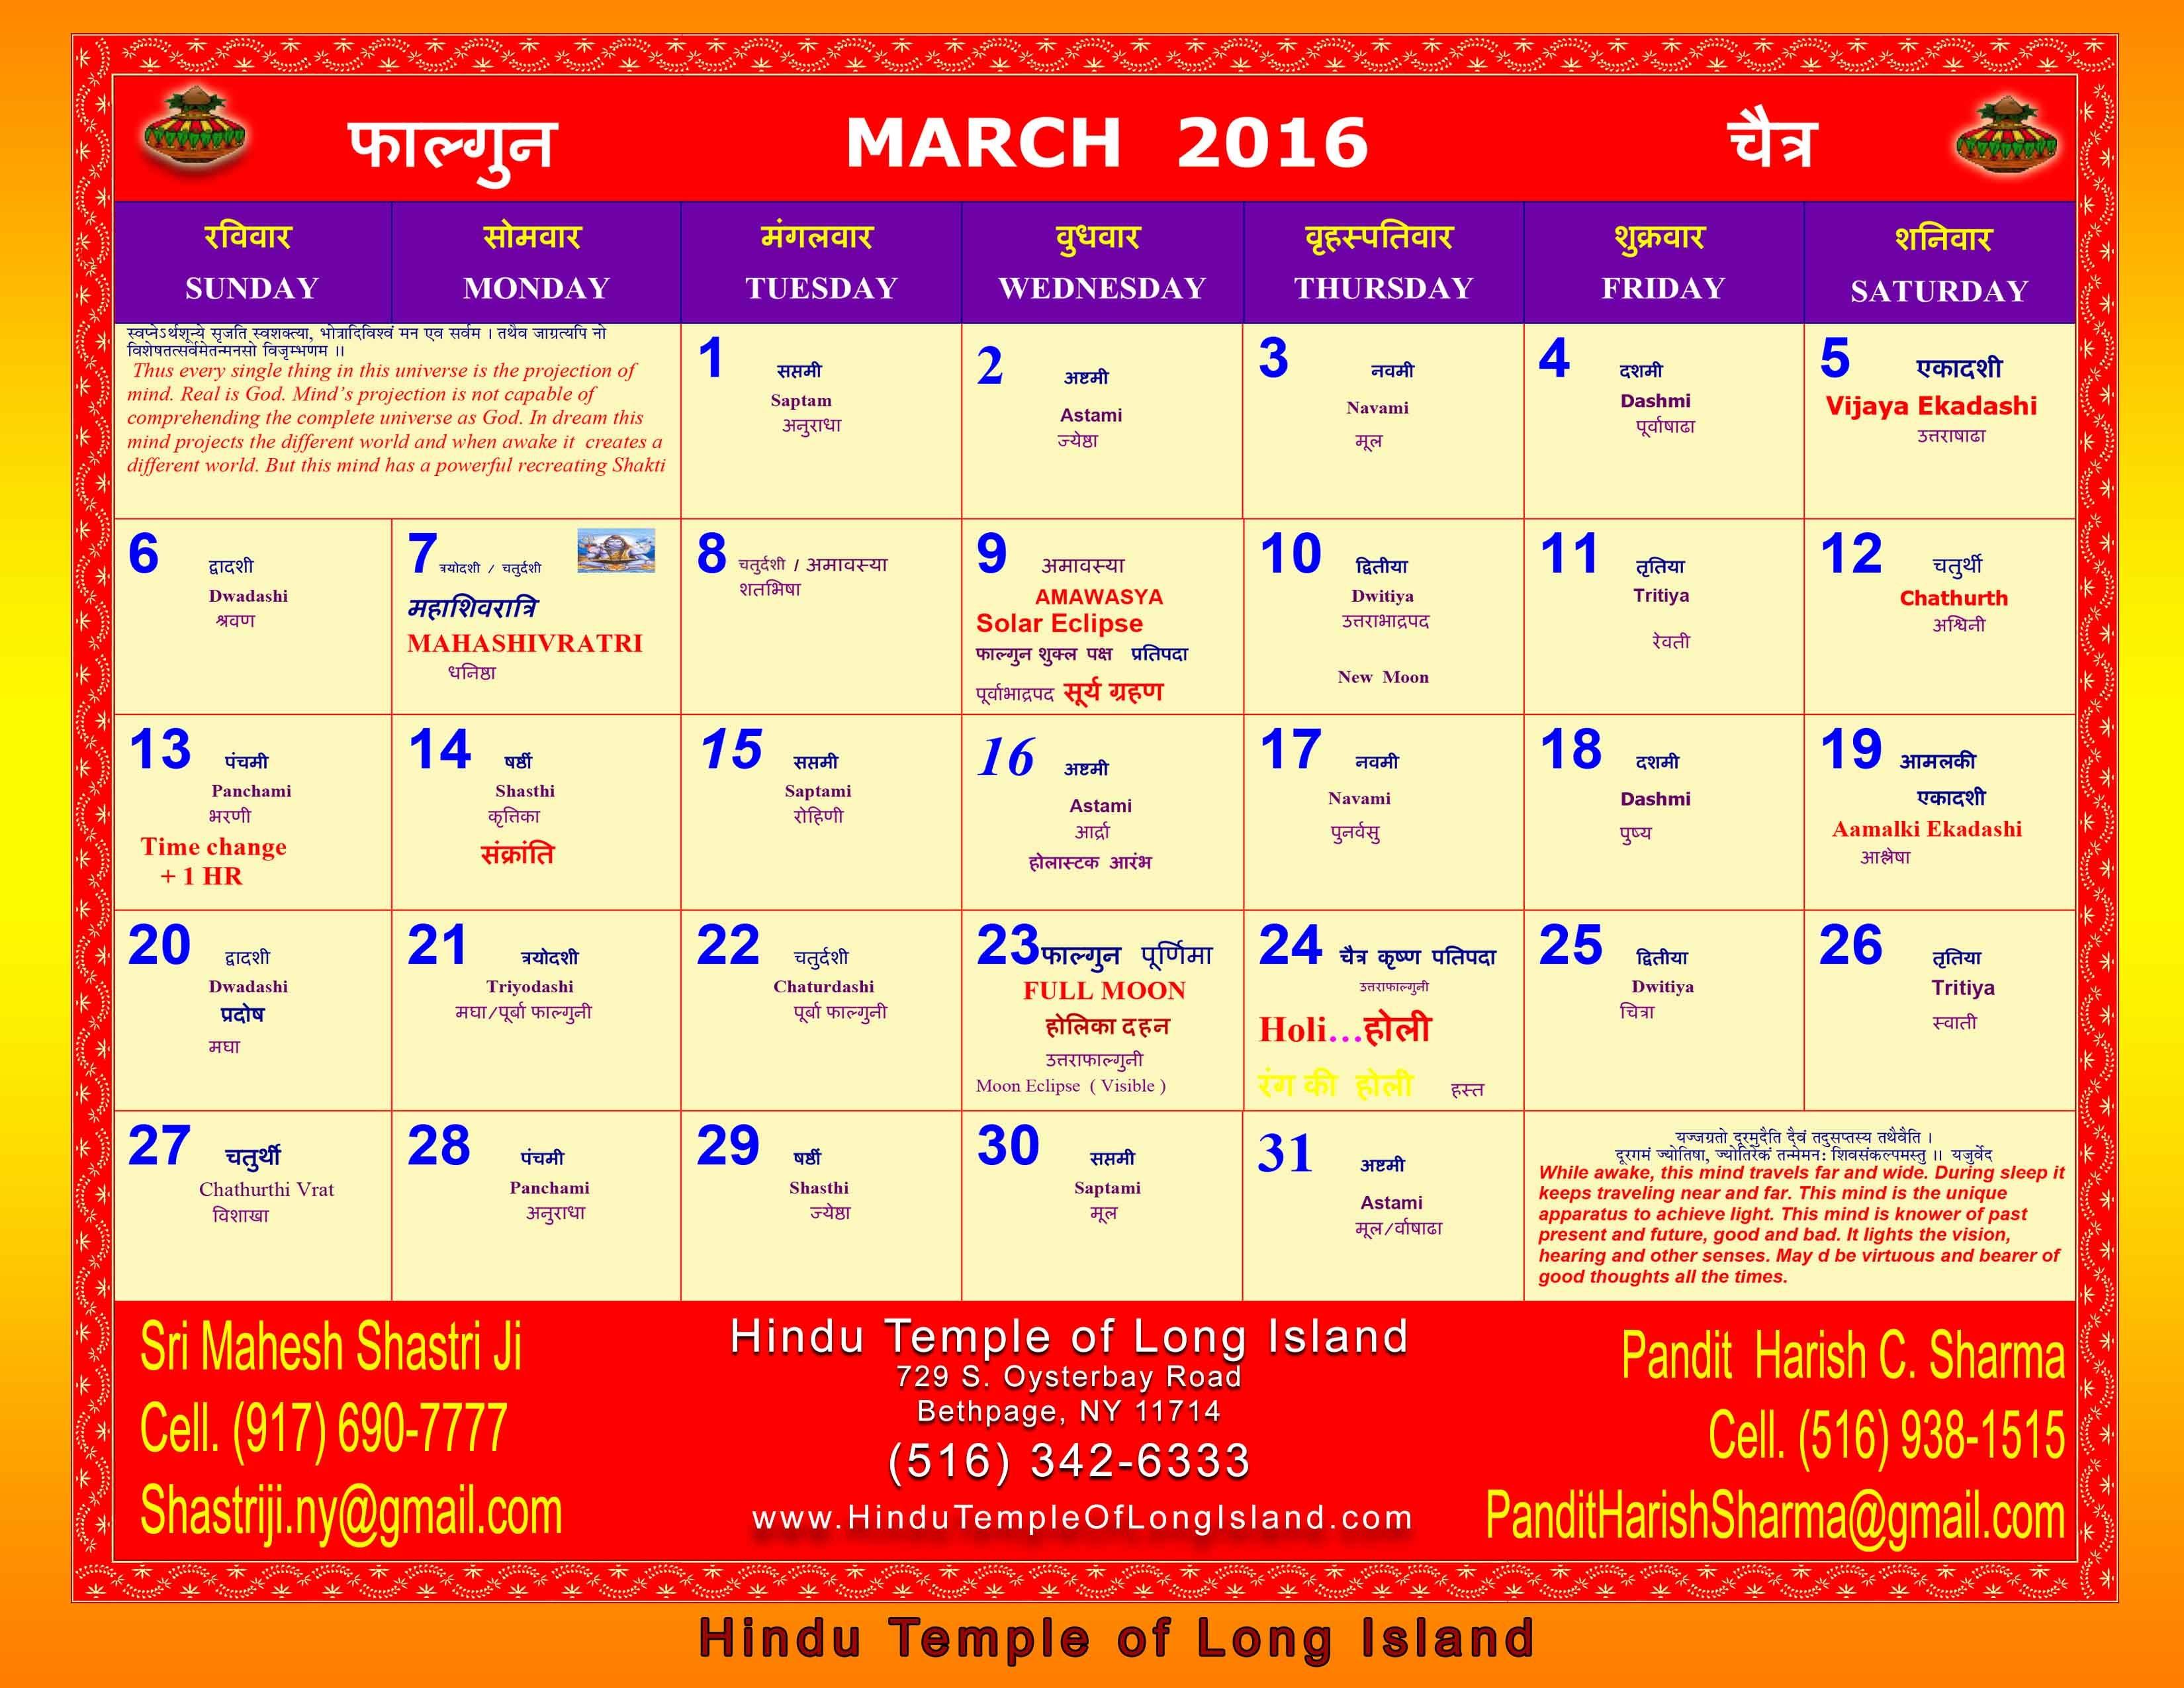 Hindu Calendar For Year 2012 2011 2010 2009 2008 2007 2006